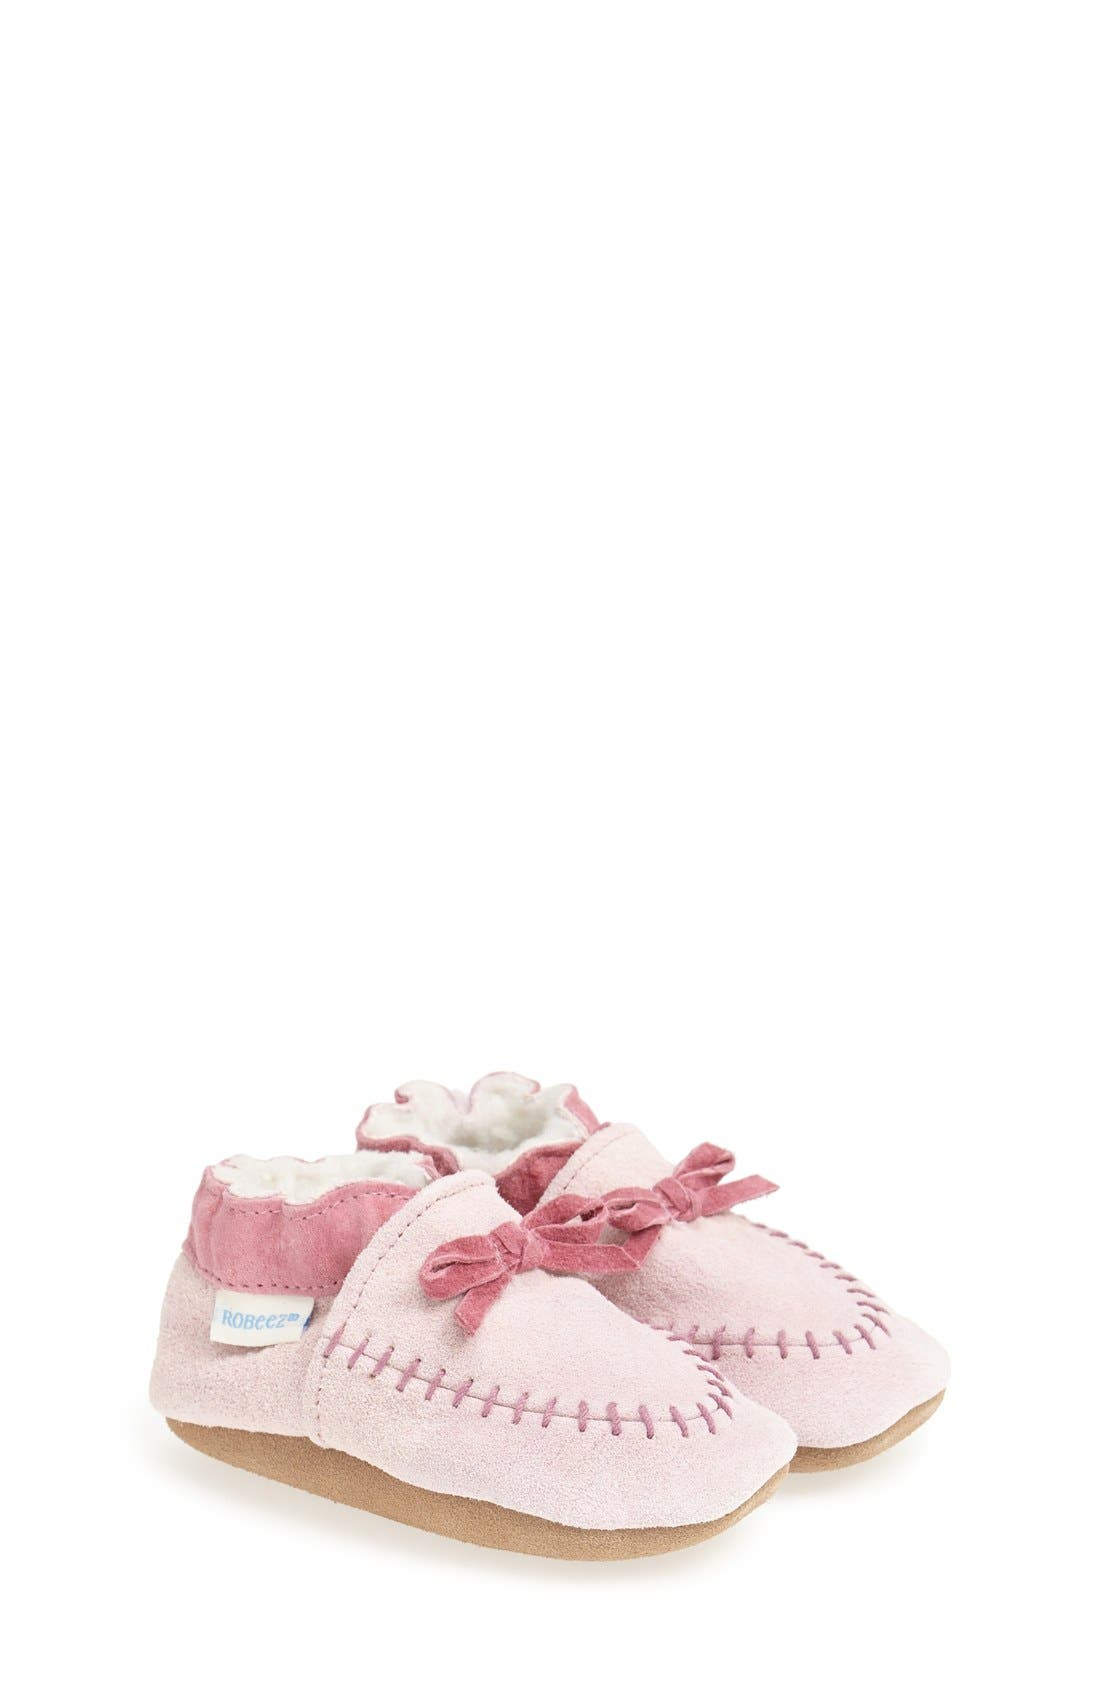 Cozy Moccasin Crib Shoe,                         Main,                         color, PINK